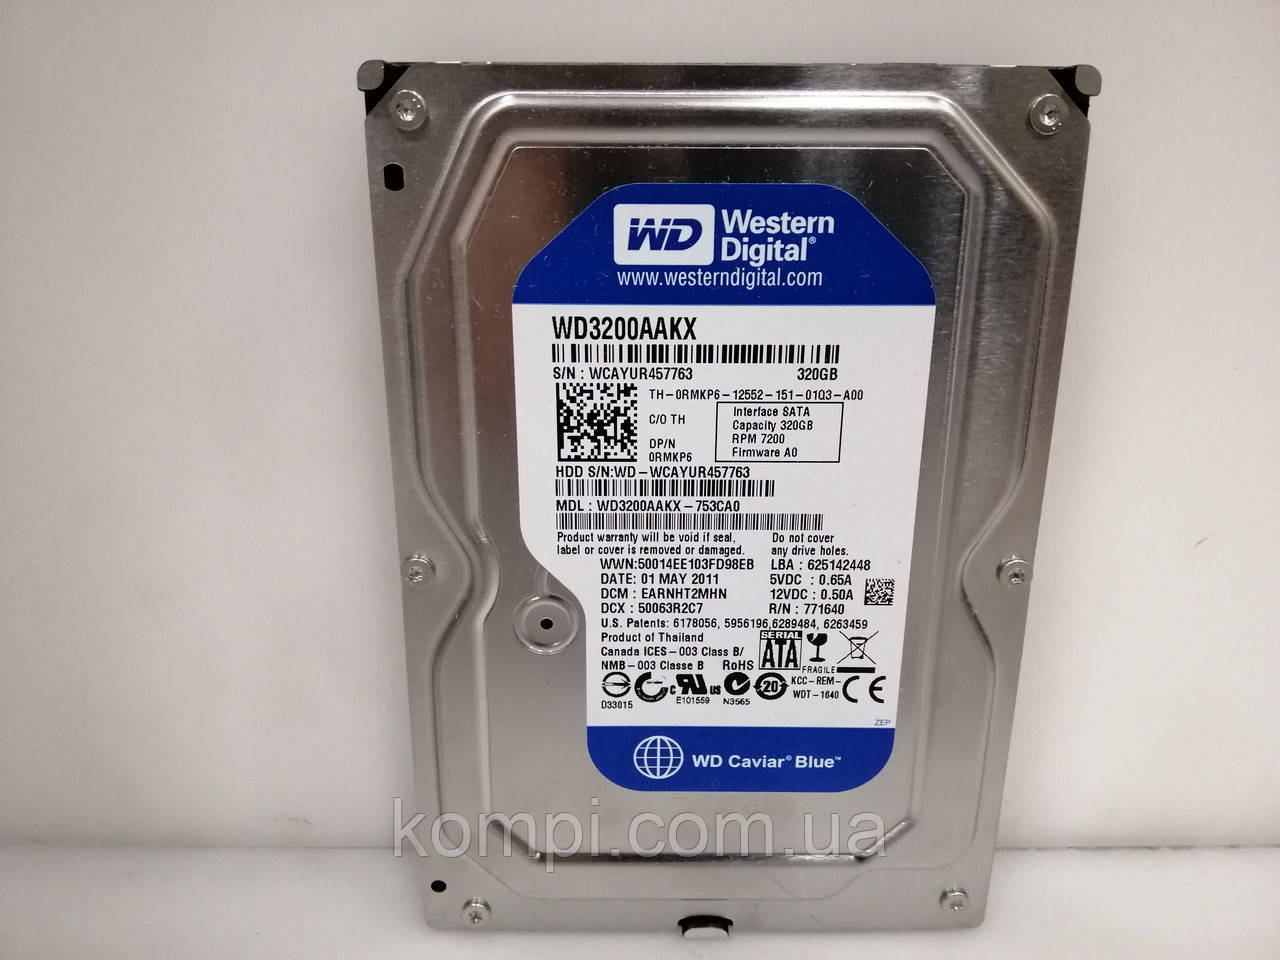 HDD Жорсткий диск Western Digital Caviar Blue 320GB 7200rpm 16MB 3.5 SATA III для ПК ІДЕАЛЬНИЙ СТАН